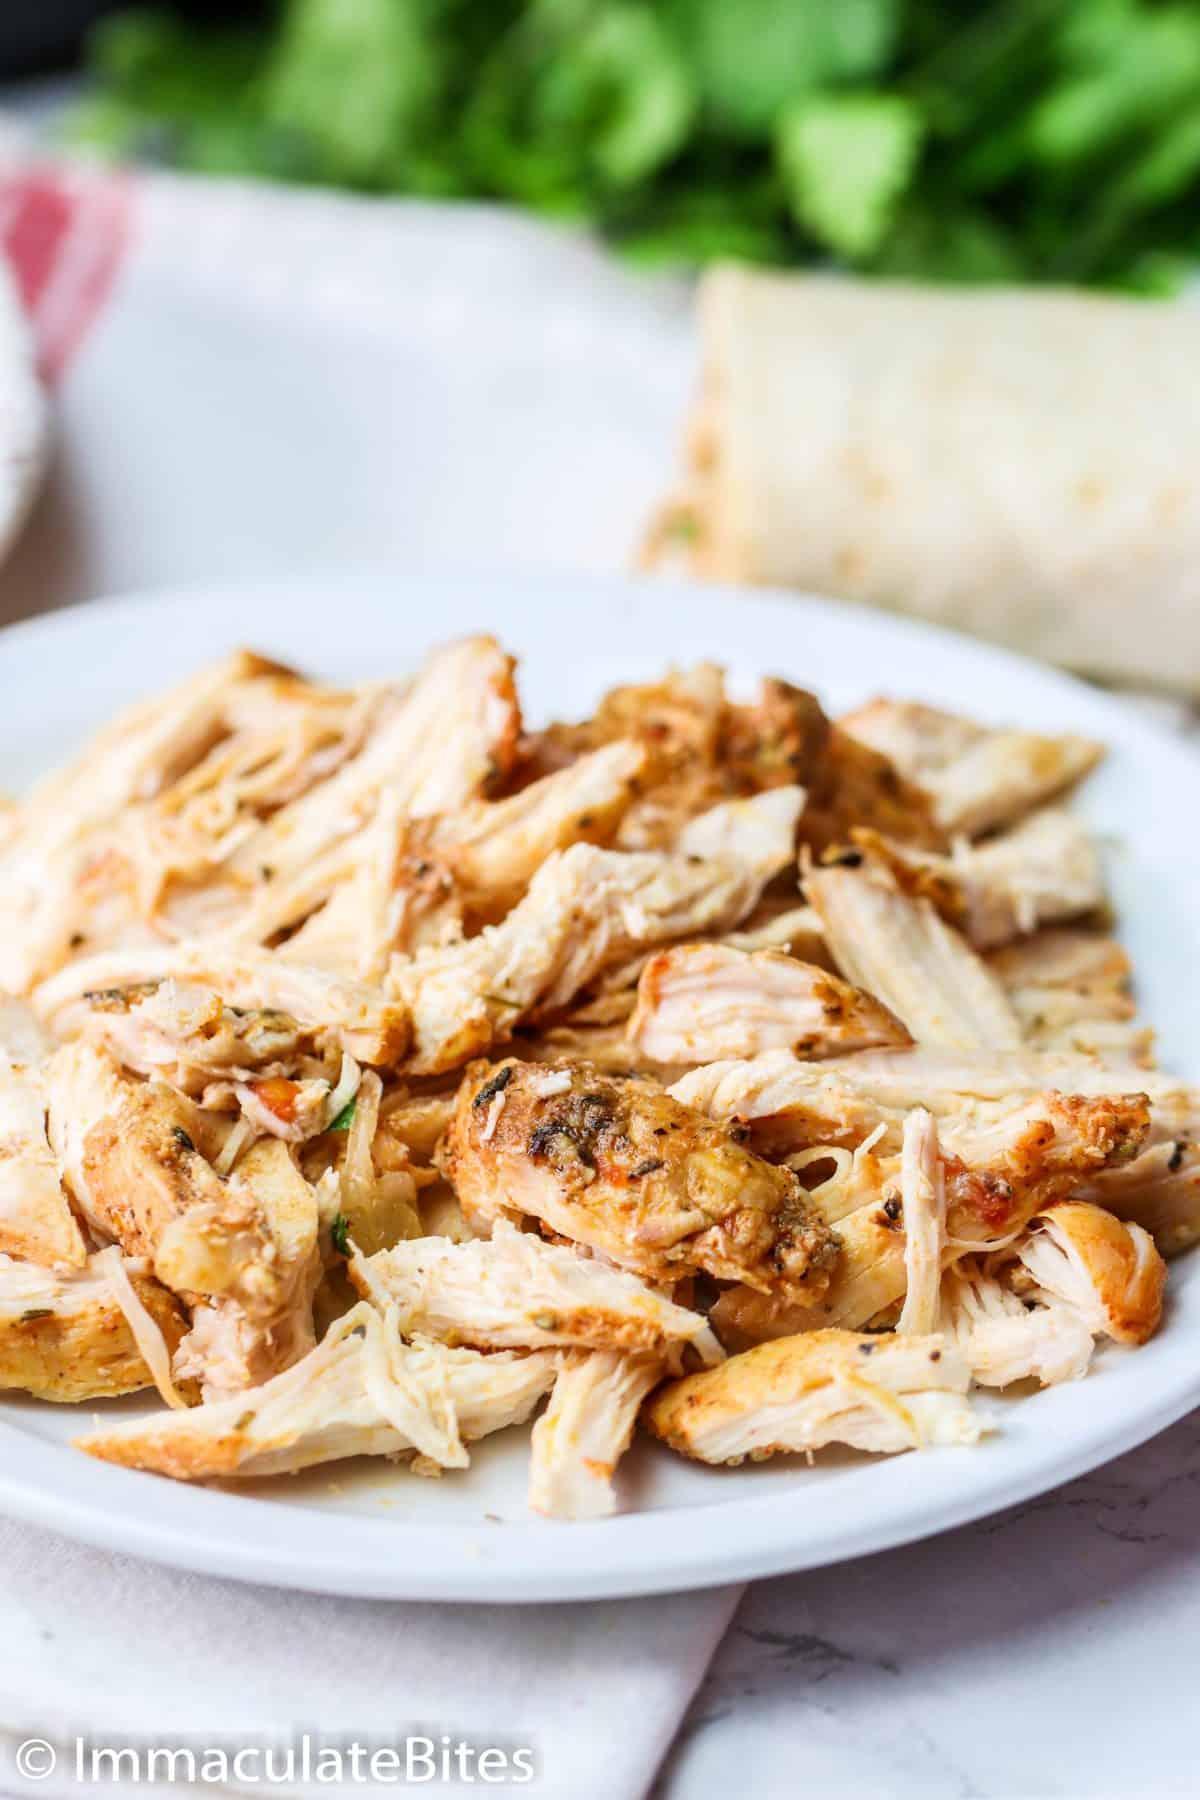 Chunky Shredded Chicken